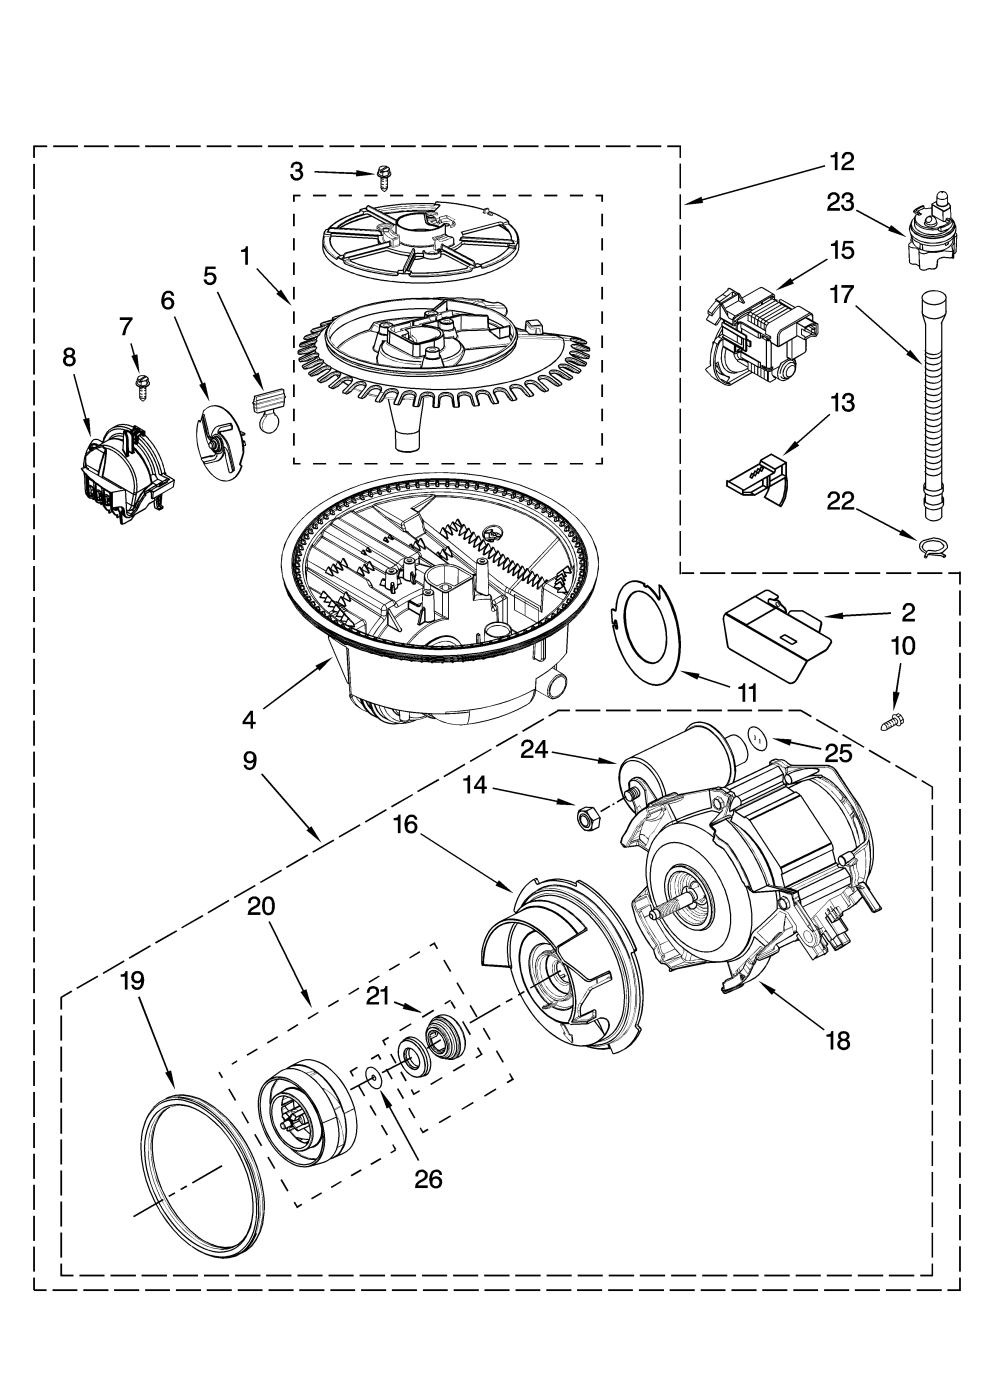 medium resolution of kitchenaid dishwasher wiring harness diagram wiring diagram centrekitchenaid dishwasher wiring harness diagram